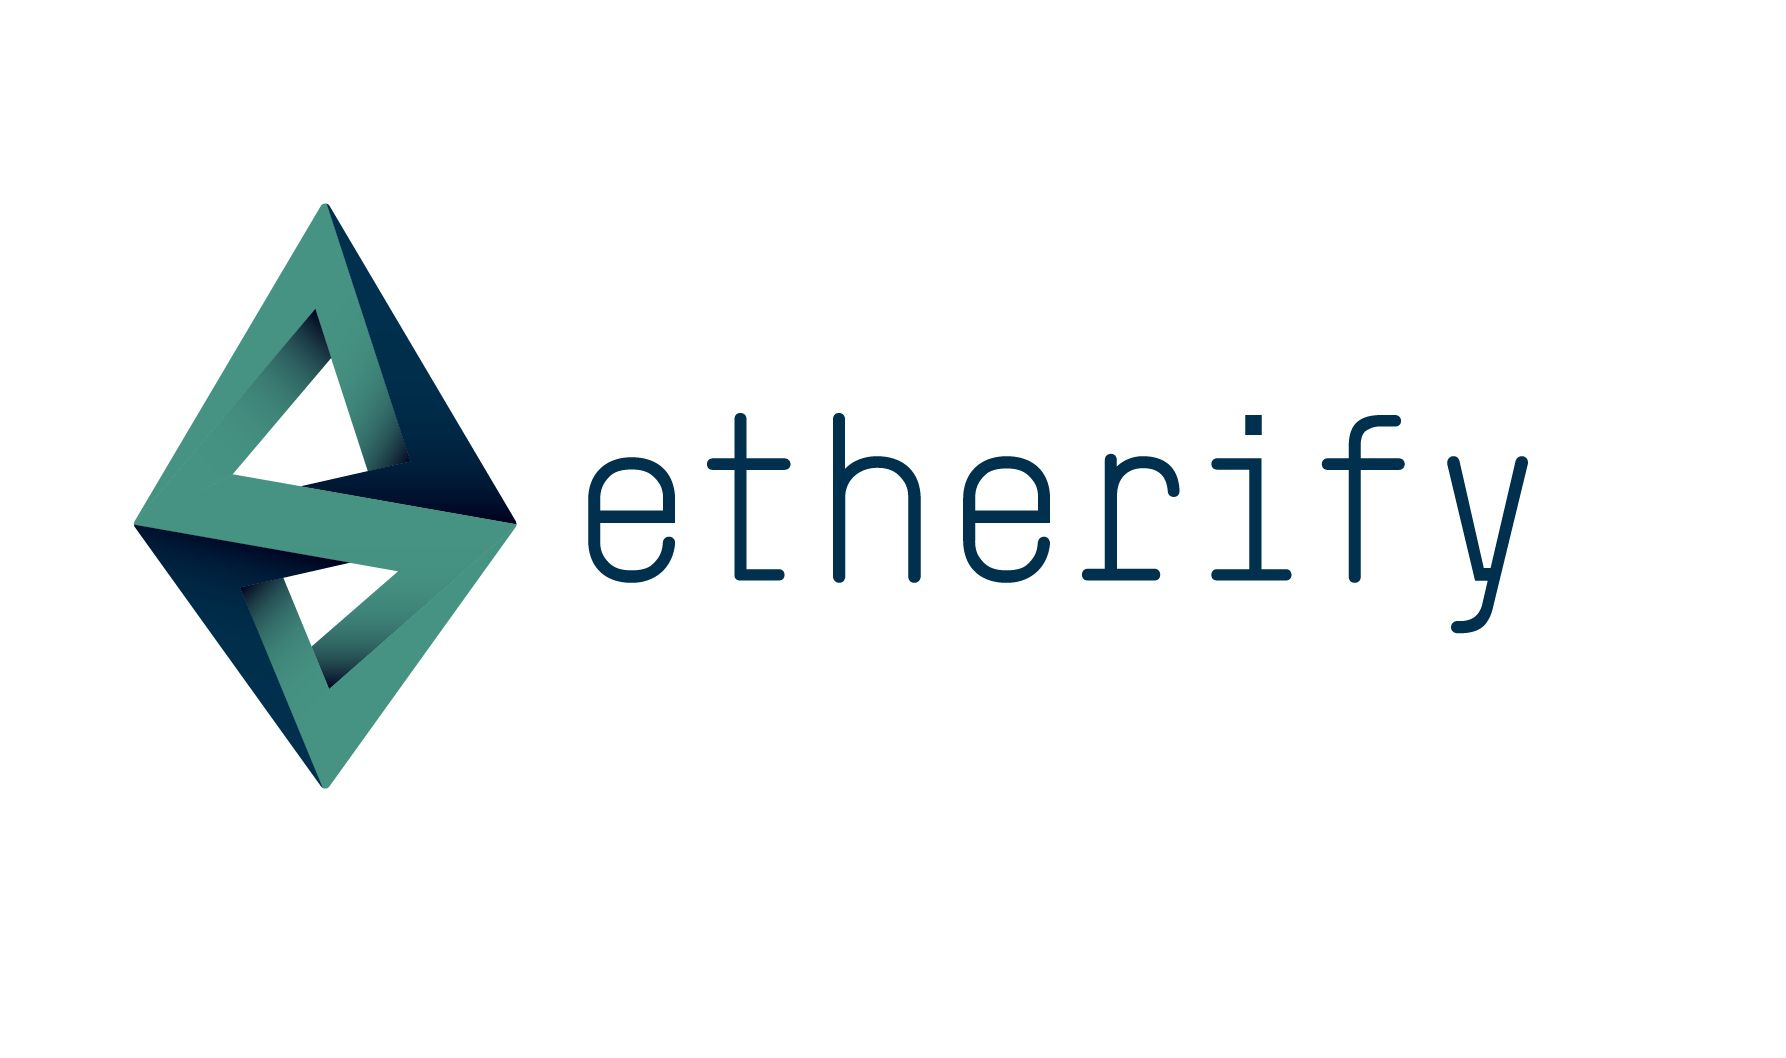 Etherify